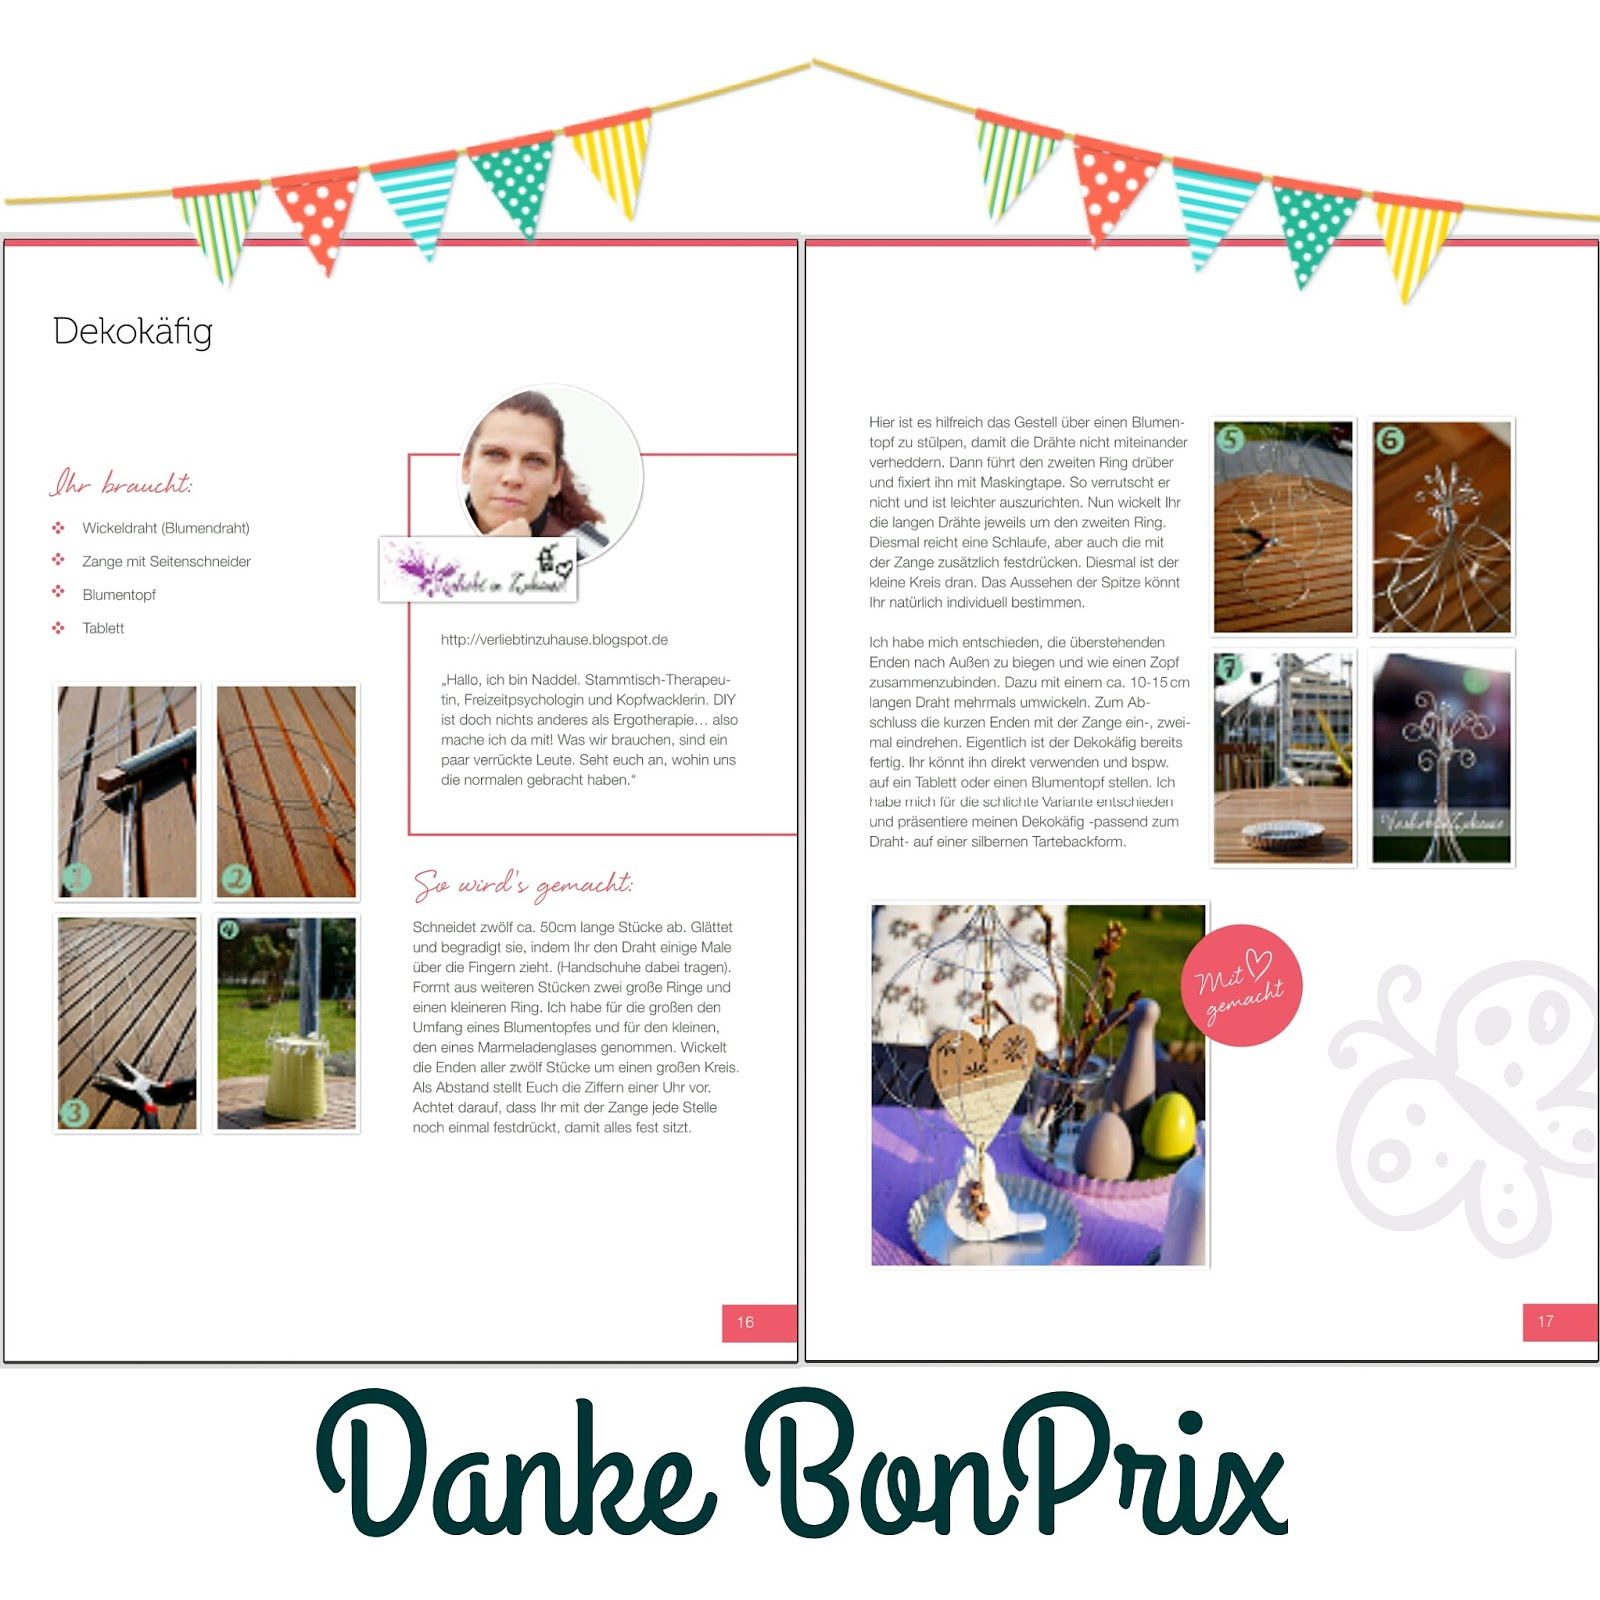 Download bonprix eBook Deko-Ideen